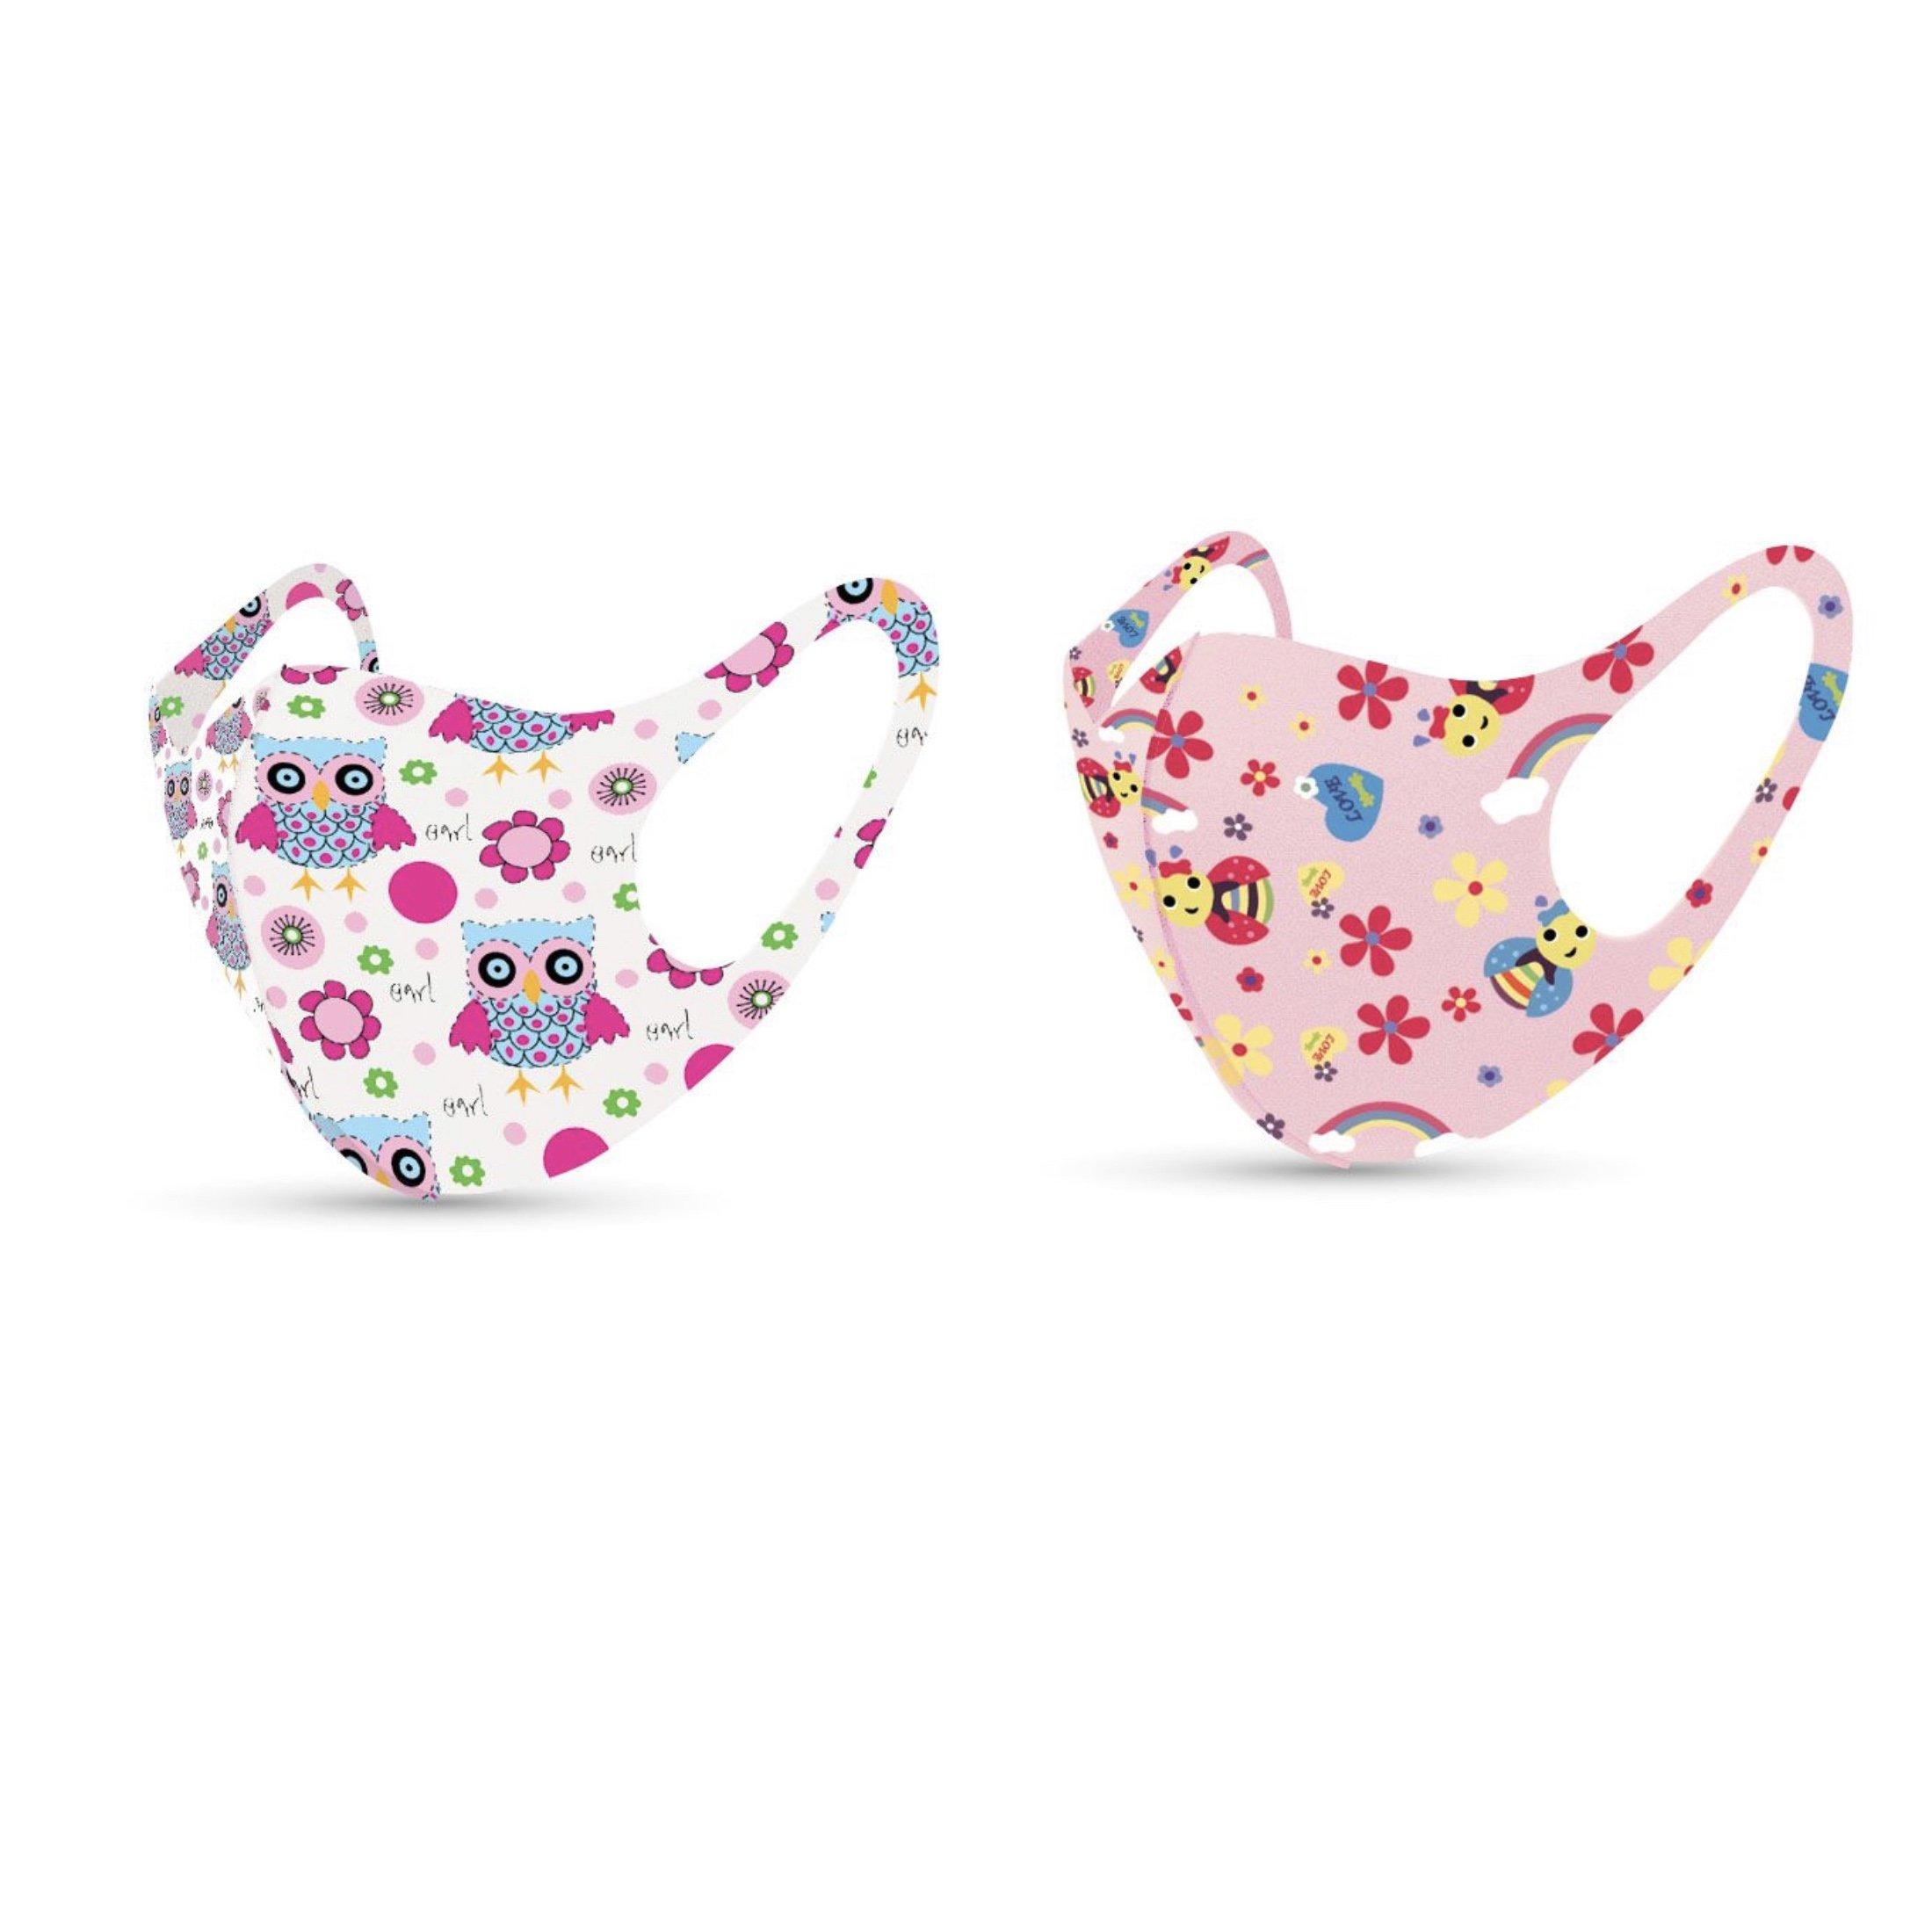 TiLi Fashion Face Mask Παιδικές Μάσκες Προσώπου Πολλαπλών Χρήσεων Με Σχέδια Μέλισσα – Κουκουβάγια Για Κορίτσι 2 Τεμάχια